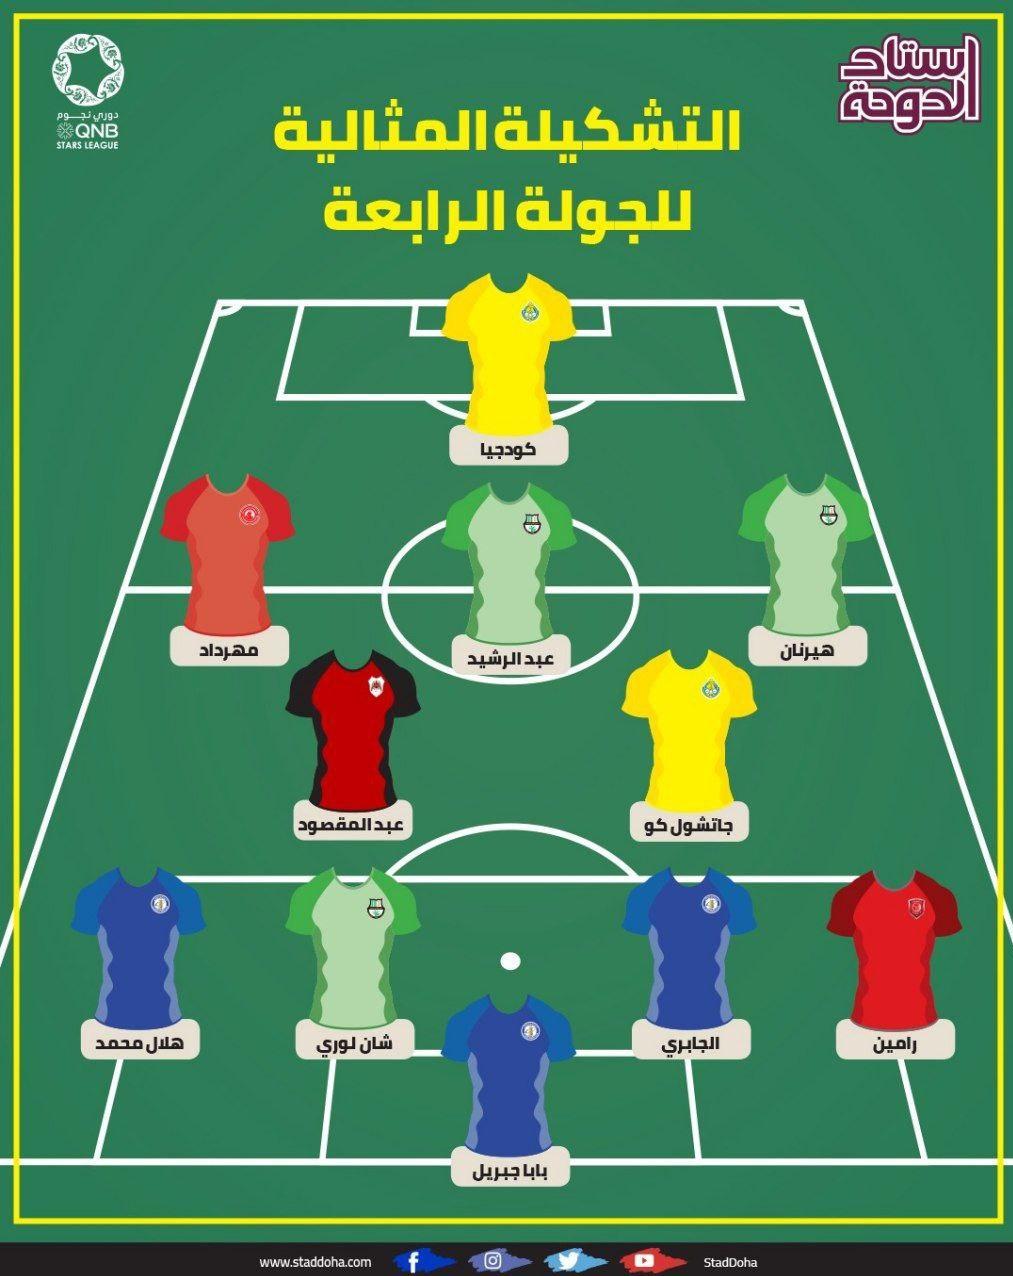 تیم منتخب هفته لیگ ستارگان قطر